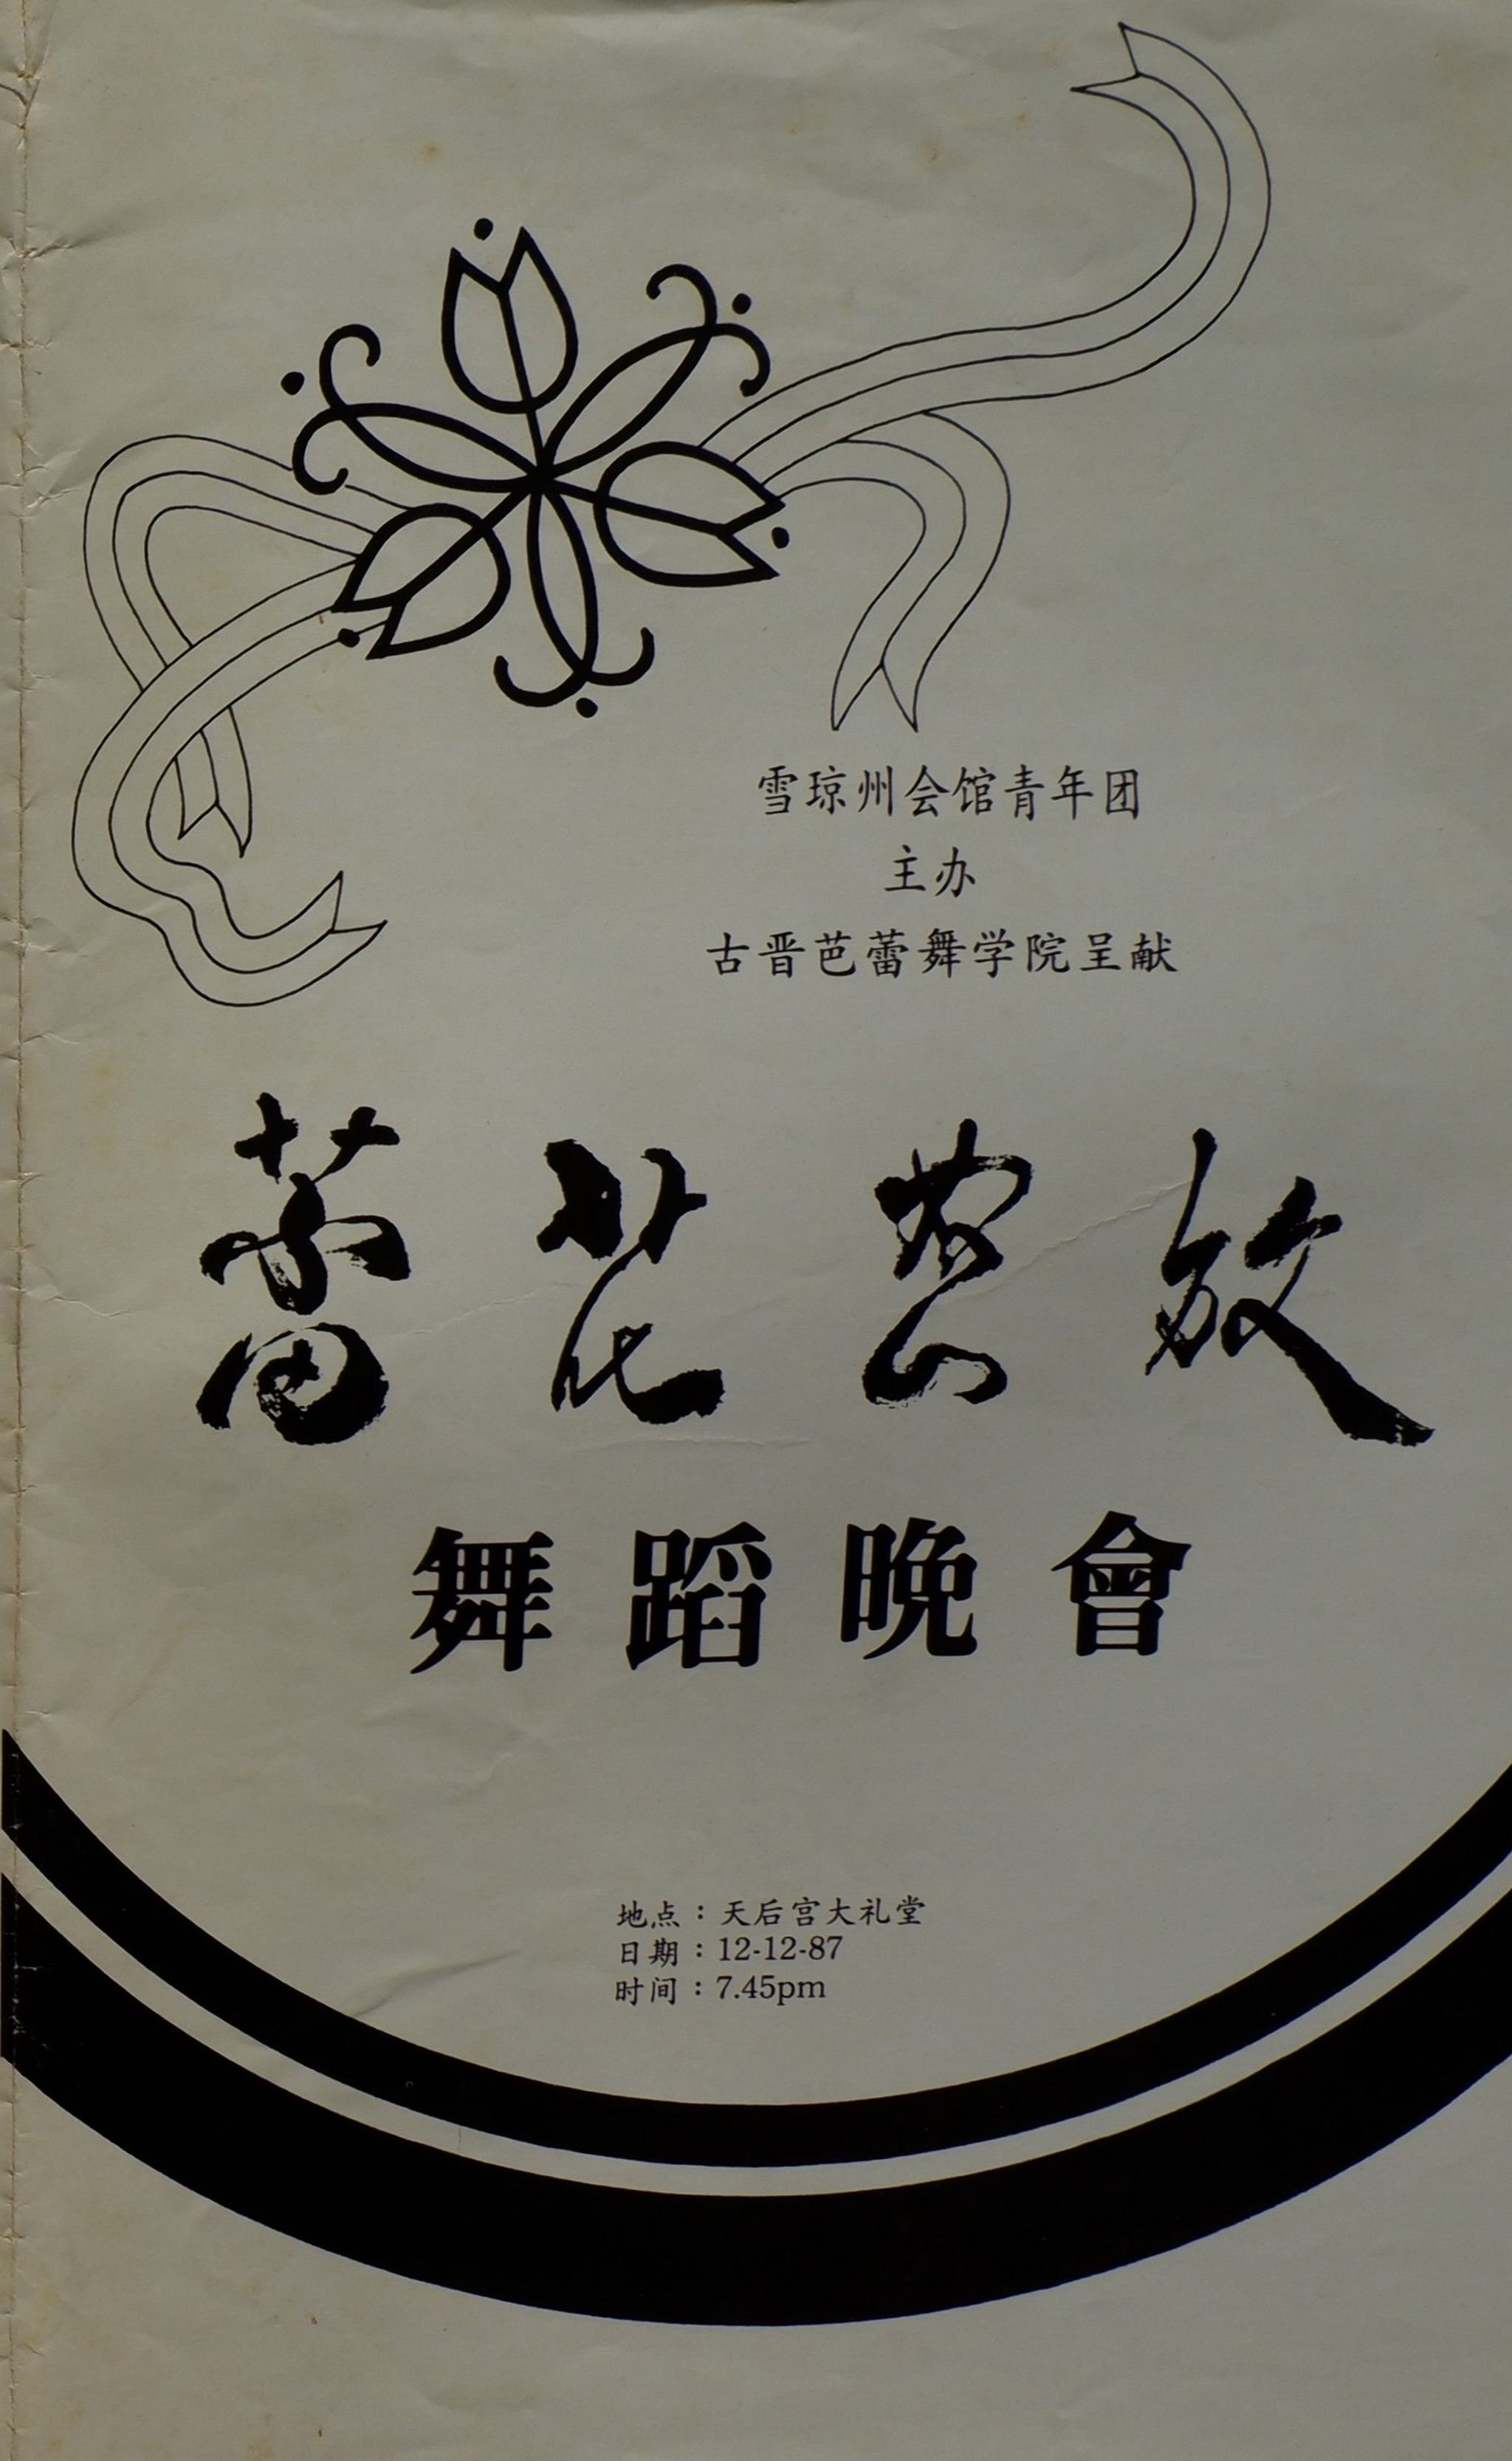 1987 Lei Hua Nu Fang Dance Evening Performance Cover